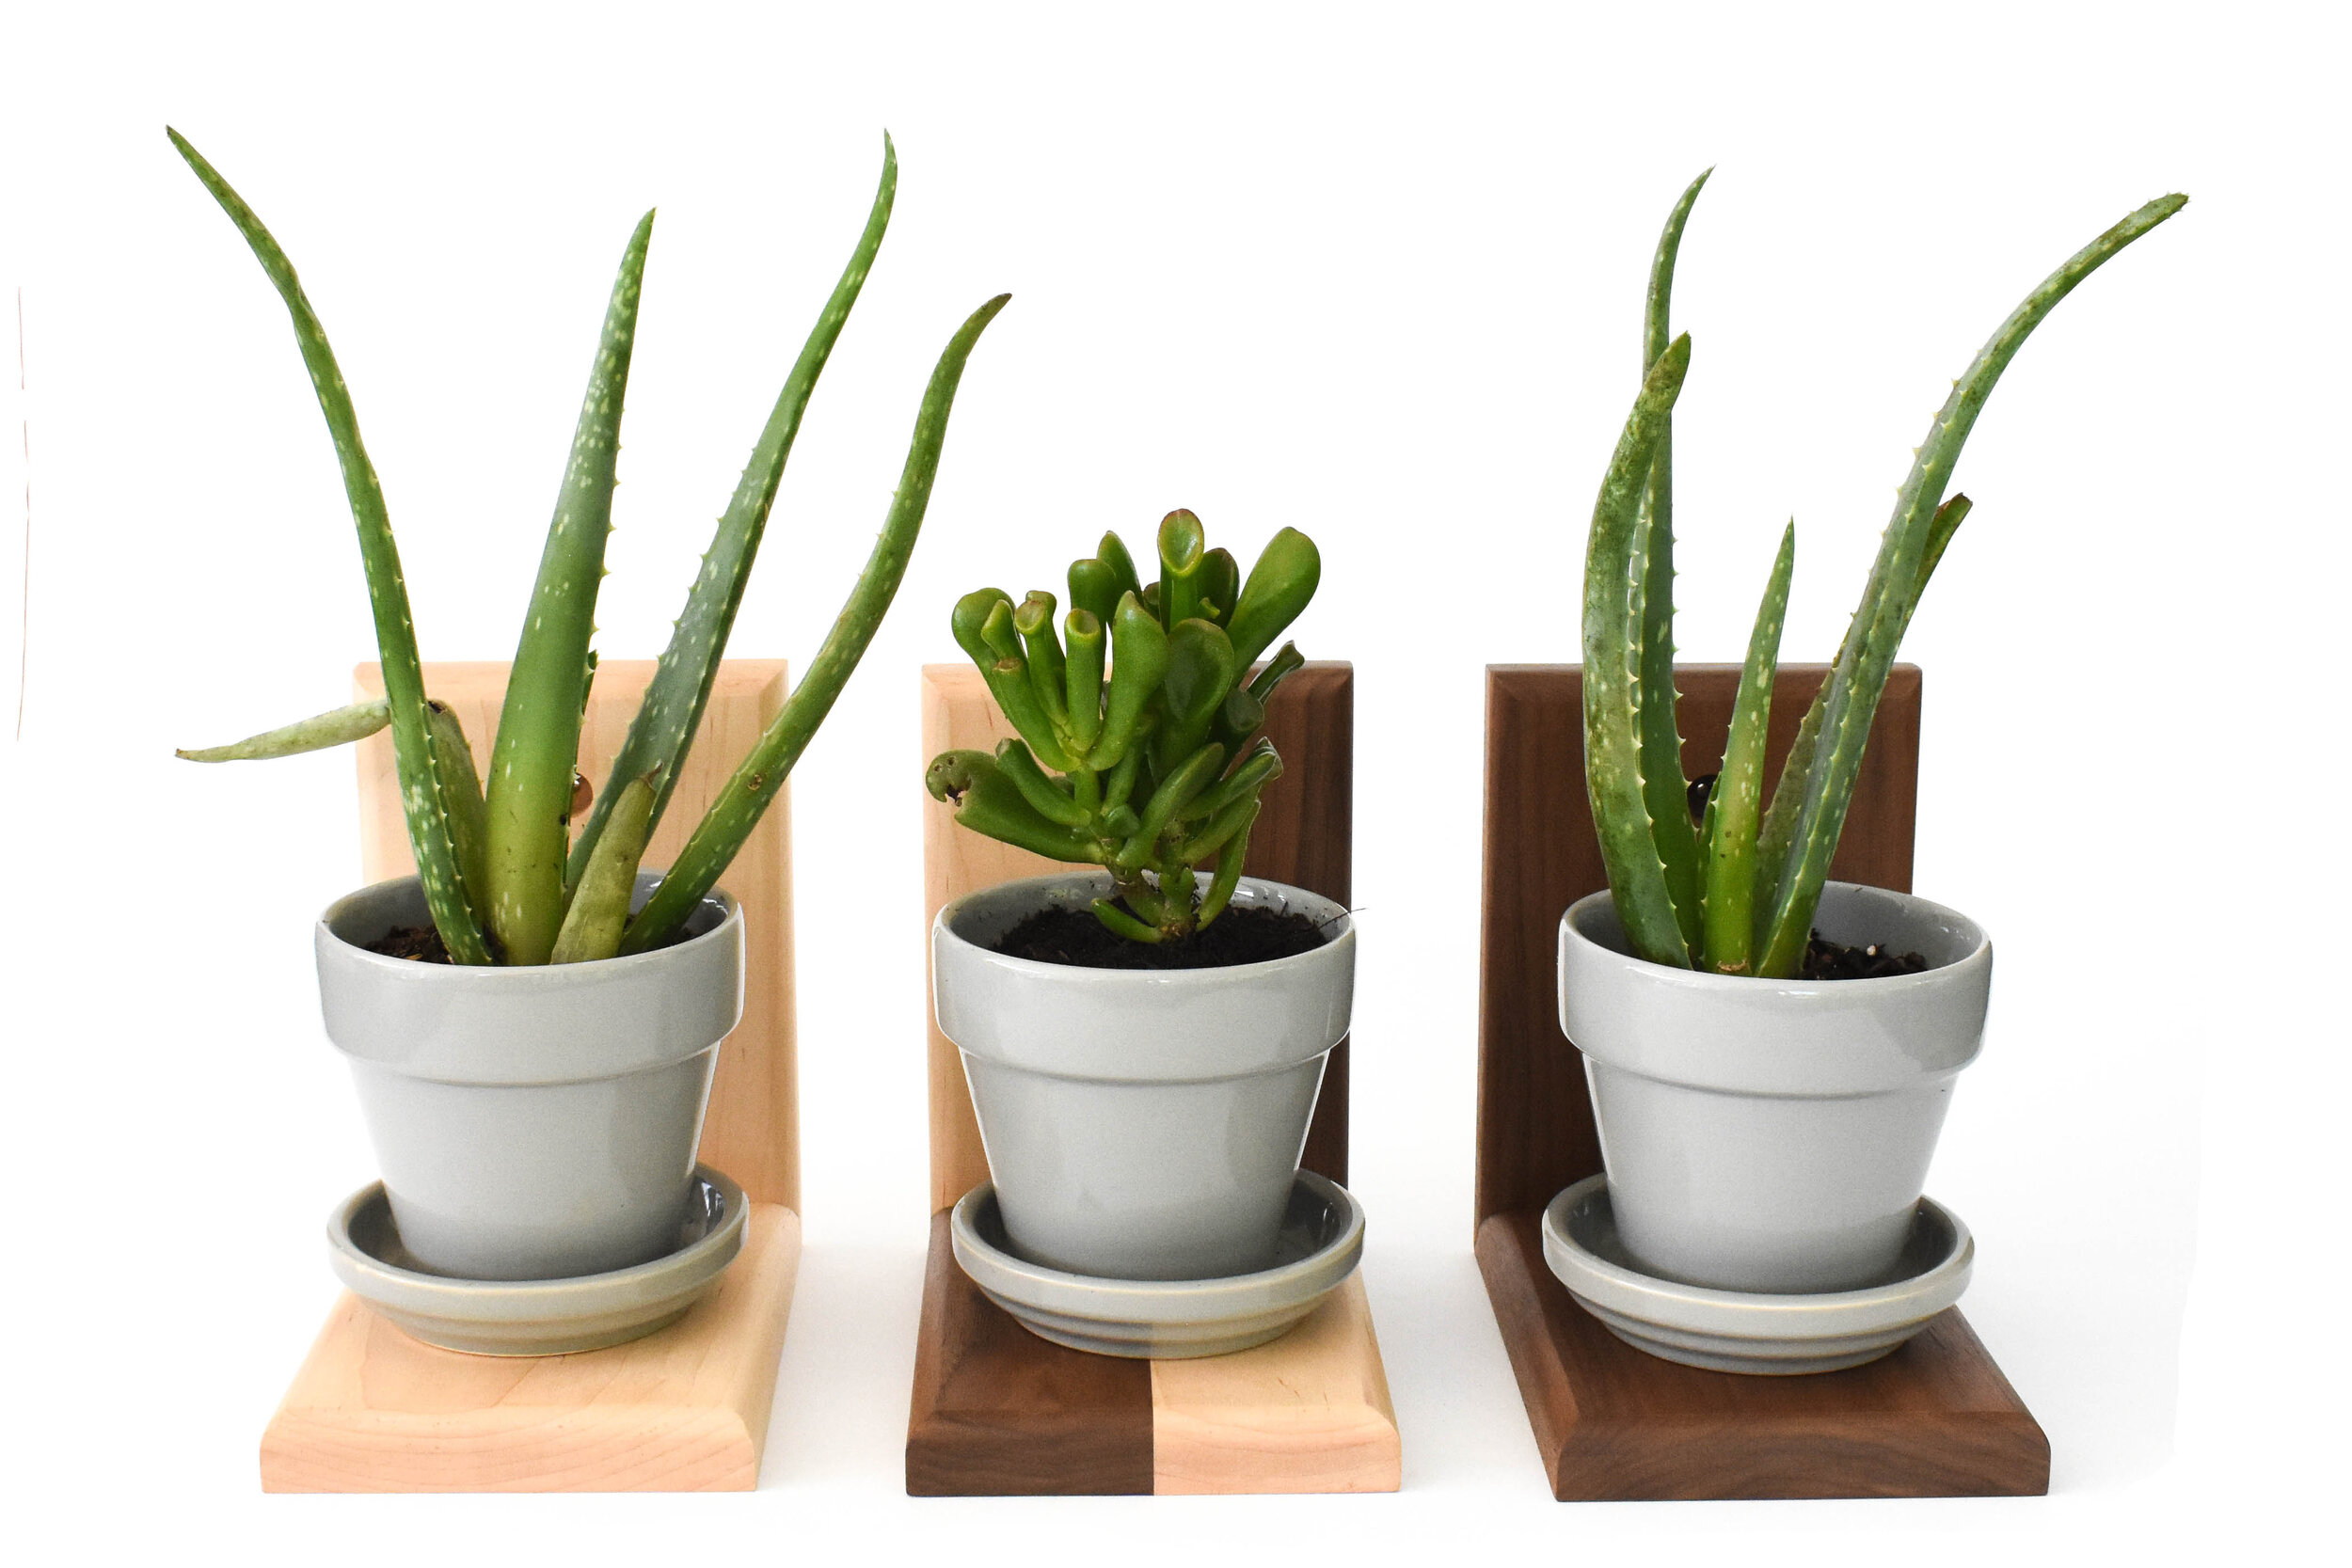 shelveswithplants.jpg